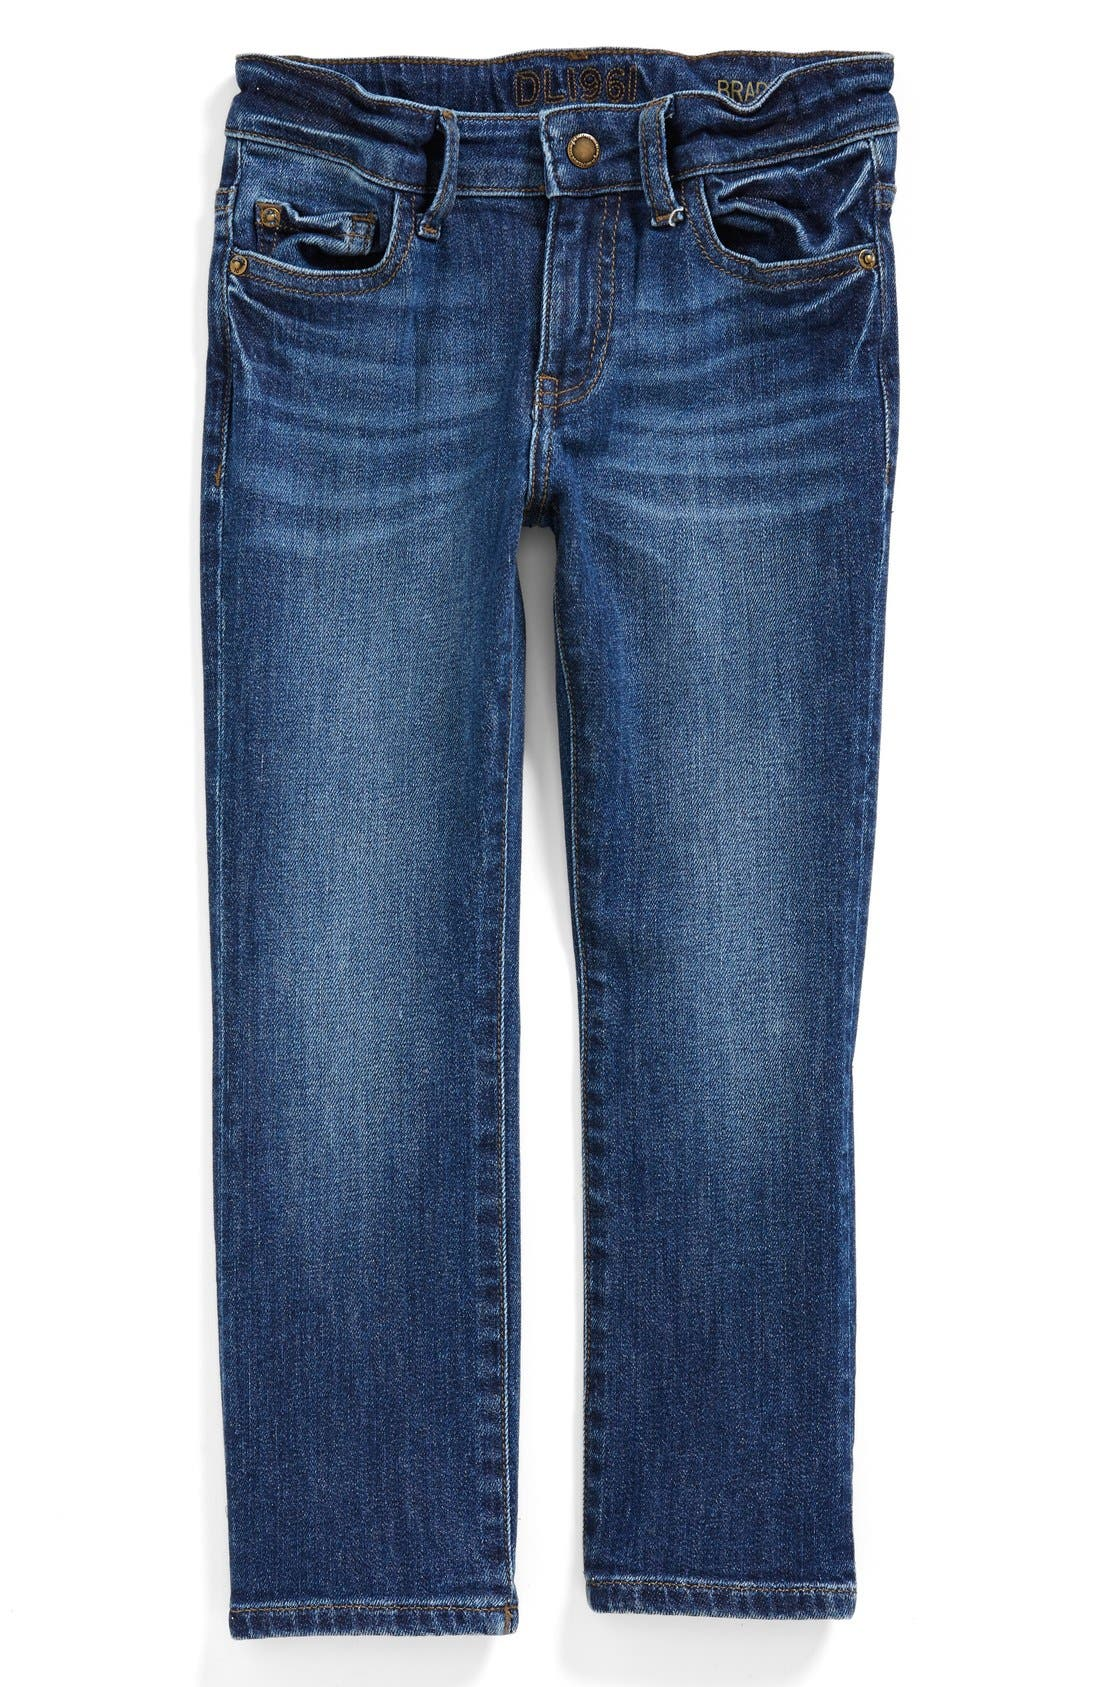 DL1961 'Brady' Slim Fit Jeans (Toddler Boys & Little Boys)